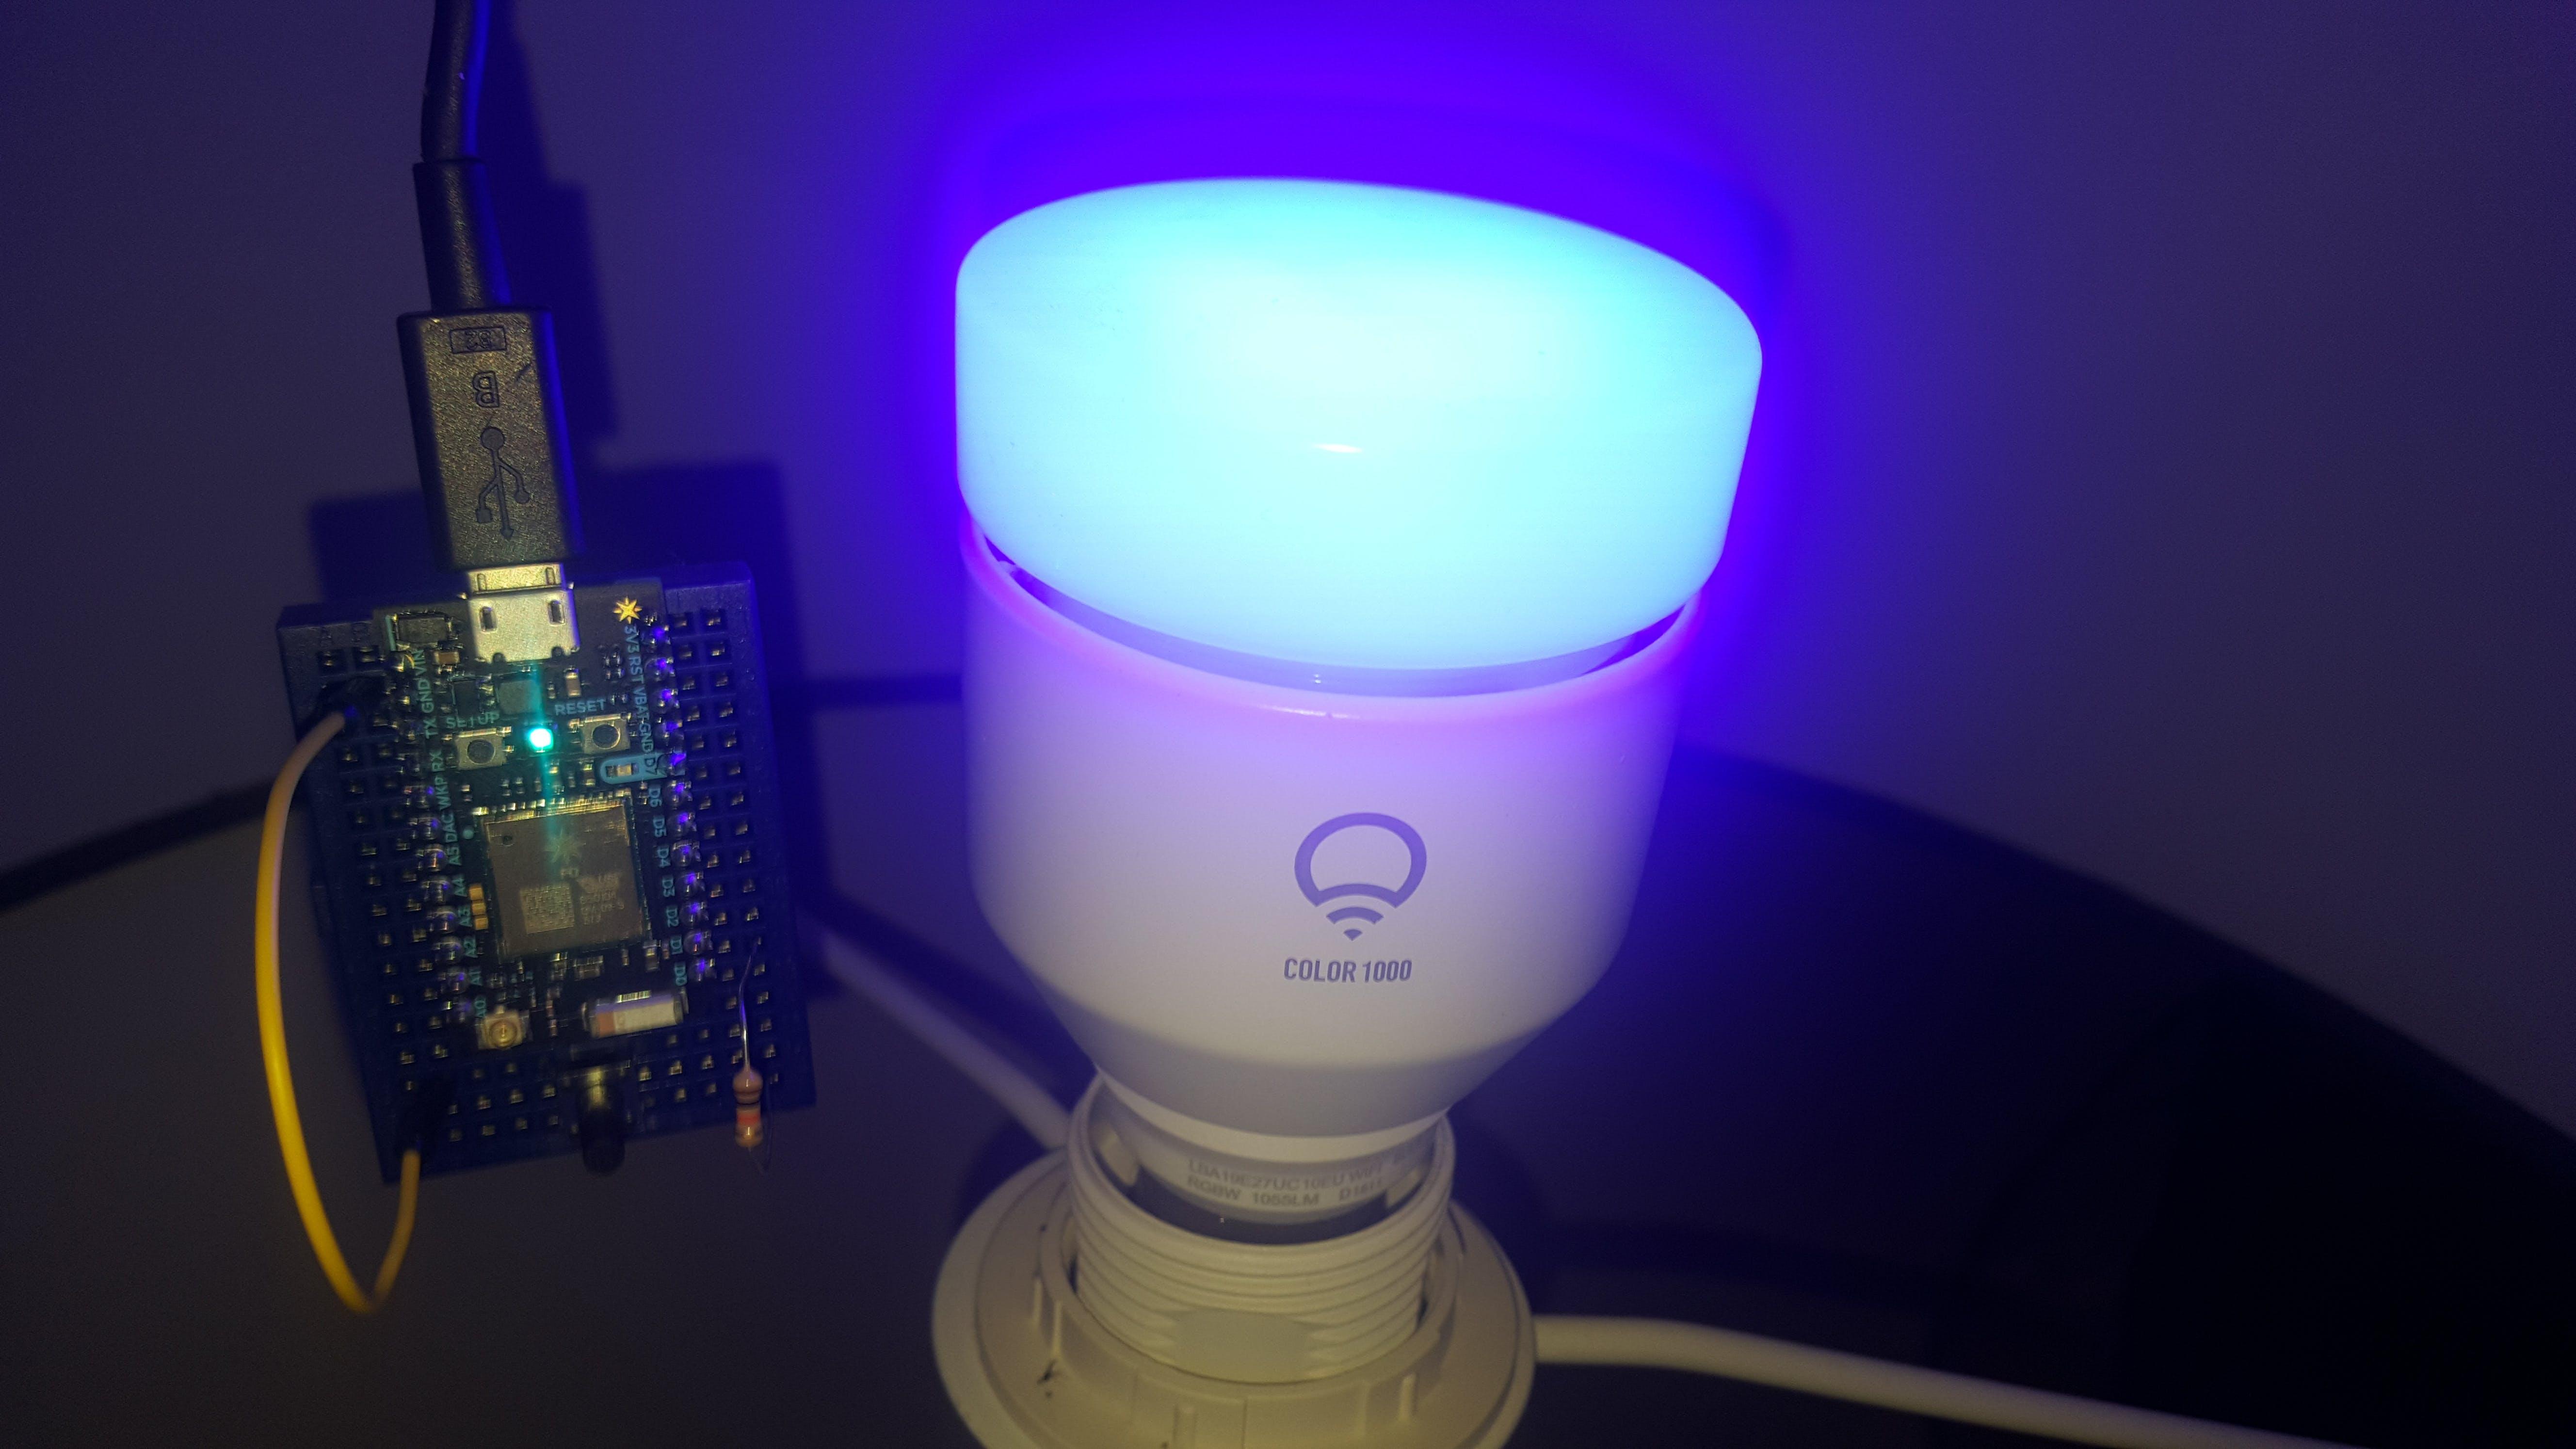 Particle Photon and LIFX Bulb (using Webhooks)